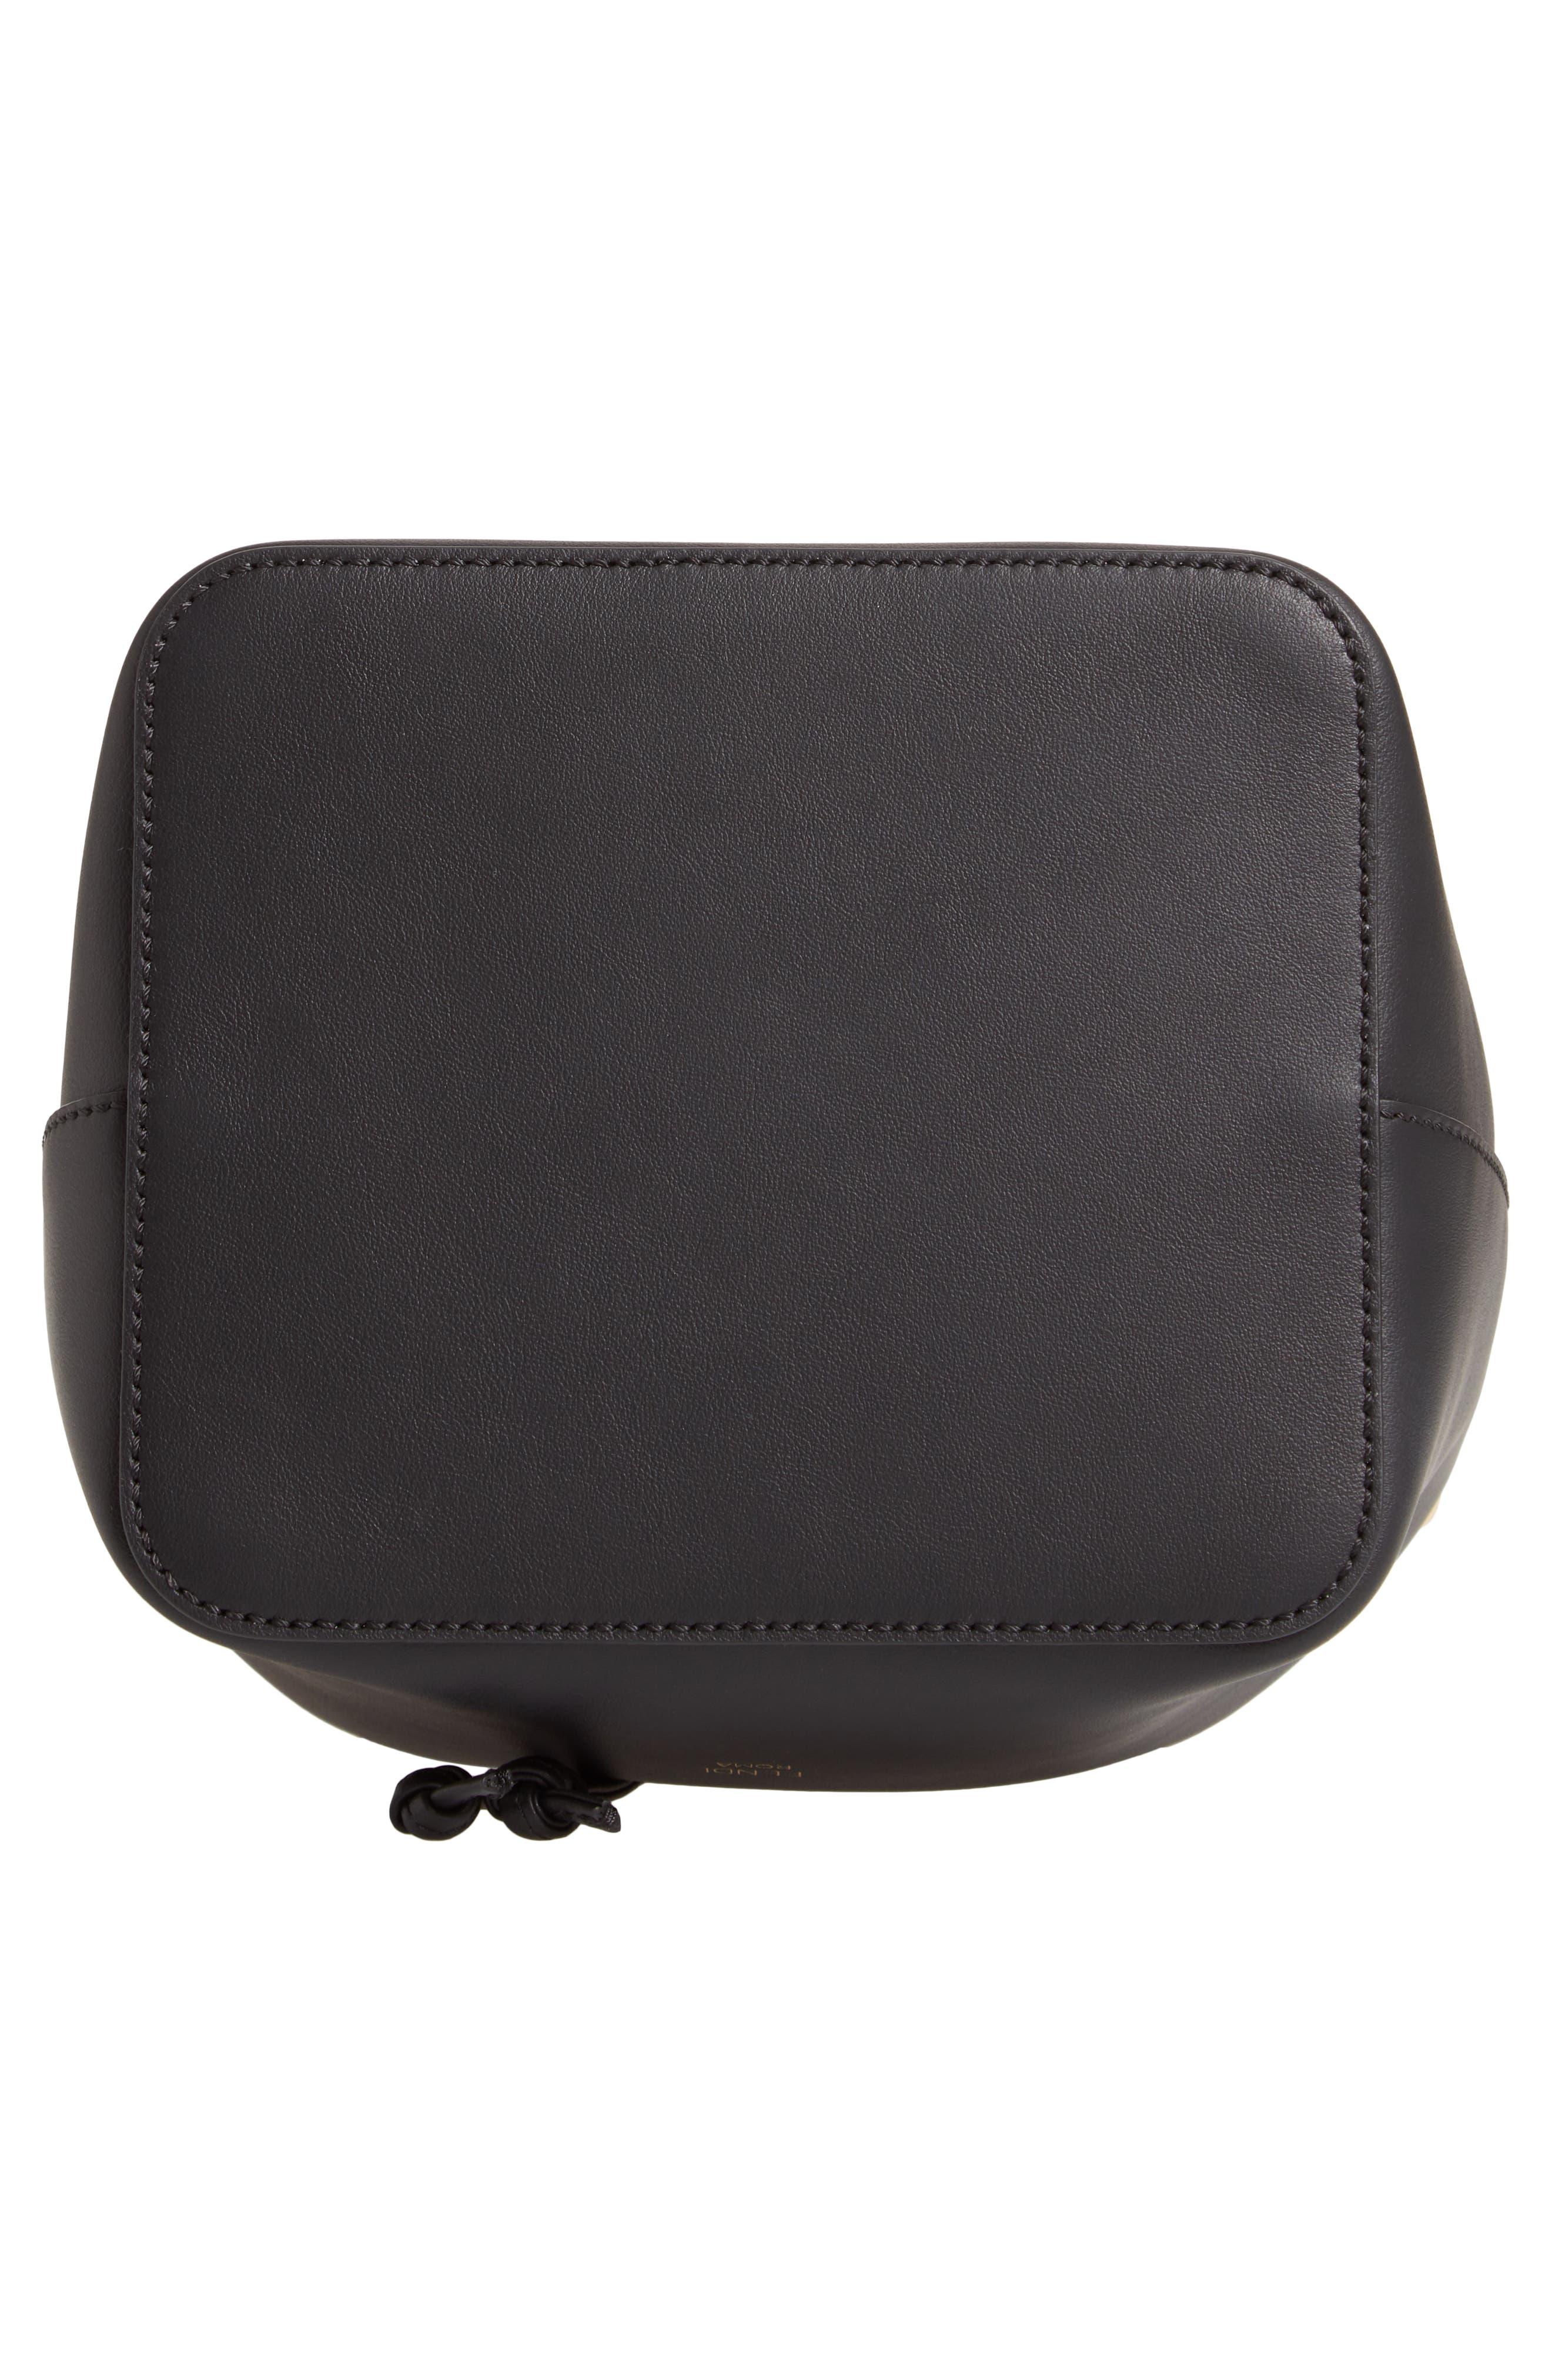 FENDI, Mon Tresor Logo Bucket Bag, Alternate thumbnail 6, color, 006